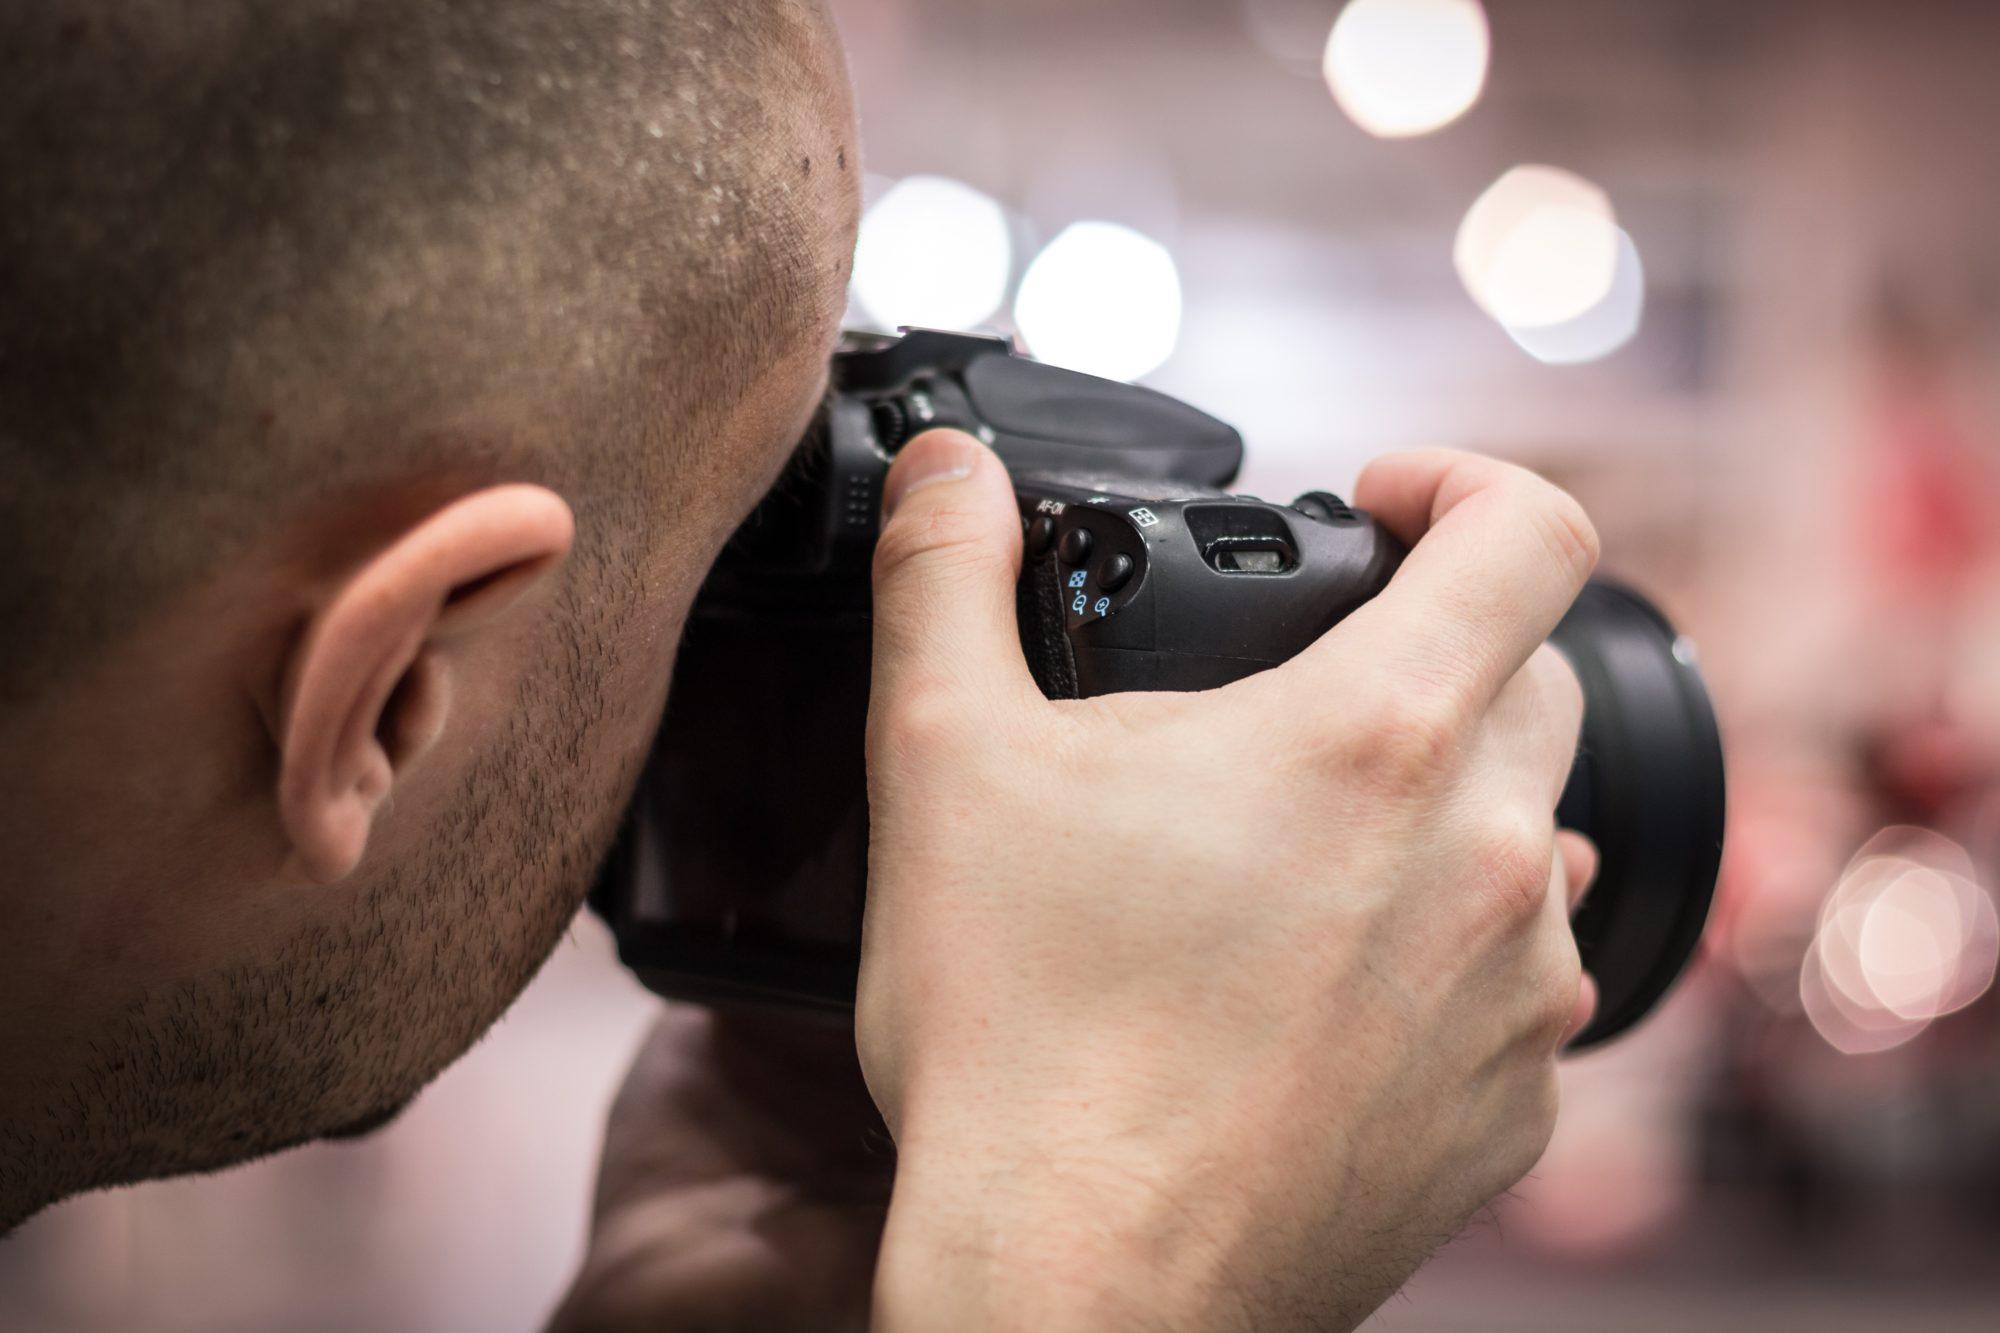 Filmprodukion, Fotoaufnahme, STRAINX